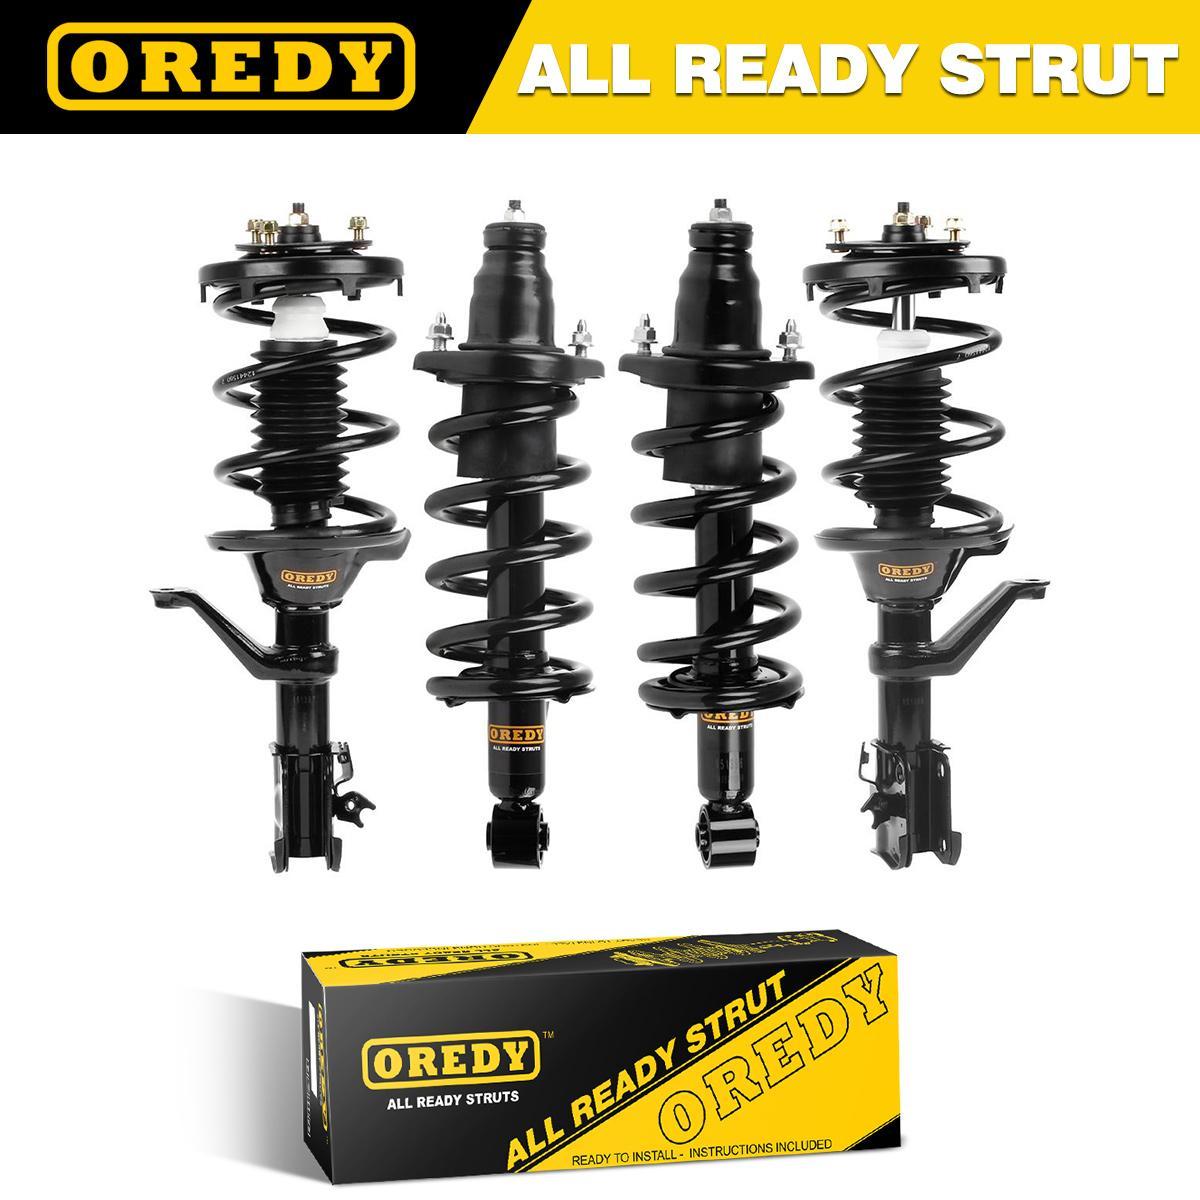 OREDY Front /& Rear Full Set of 4PCS Driver /& Passenger Side Complete Shock Strut Coil Springs Assembly Kit Compatible with Honda CR-V 2007 2008 2009 2010 2011